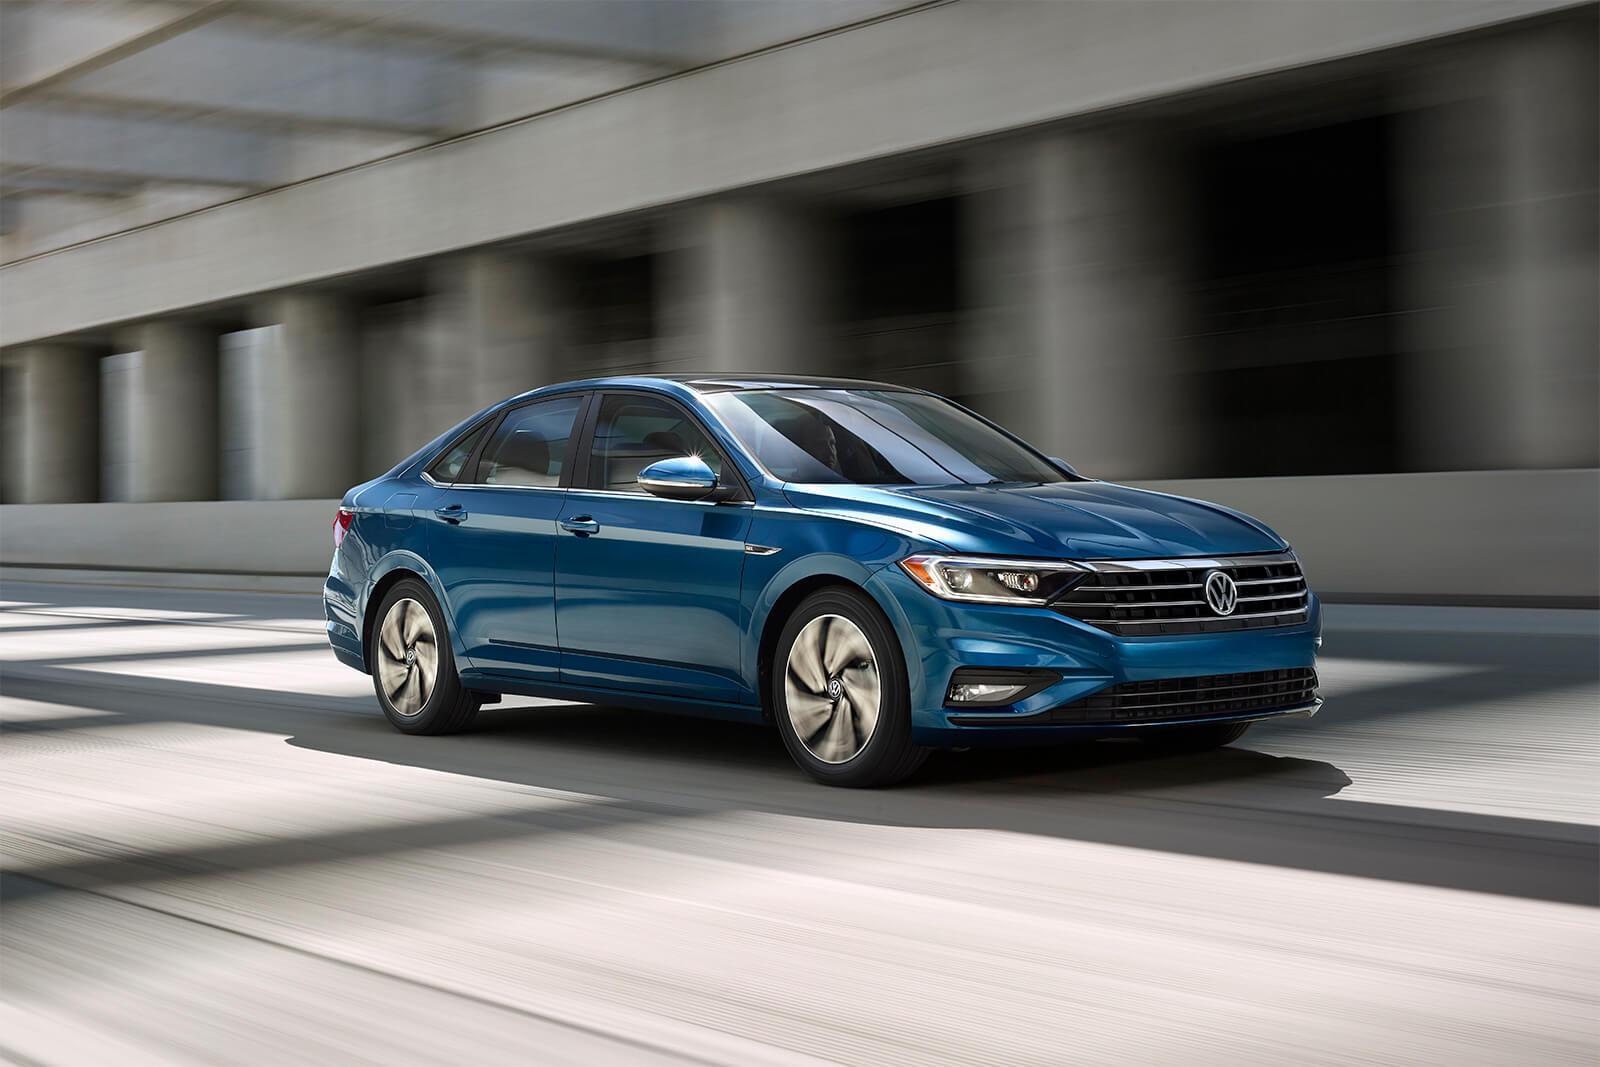 2019 Volkswagen Jetta Blue Exterior Front View